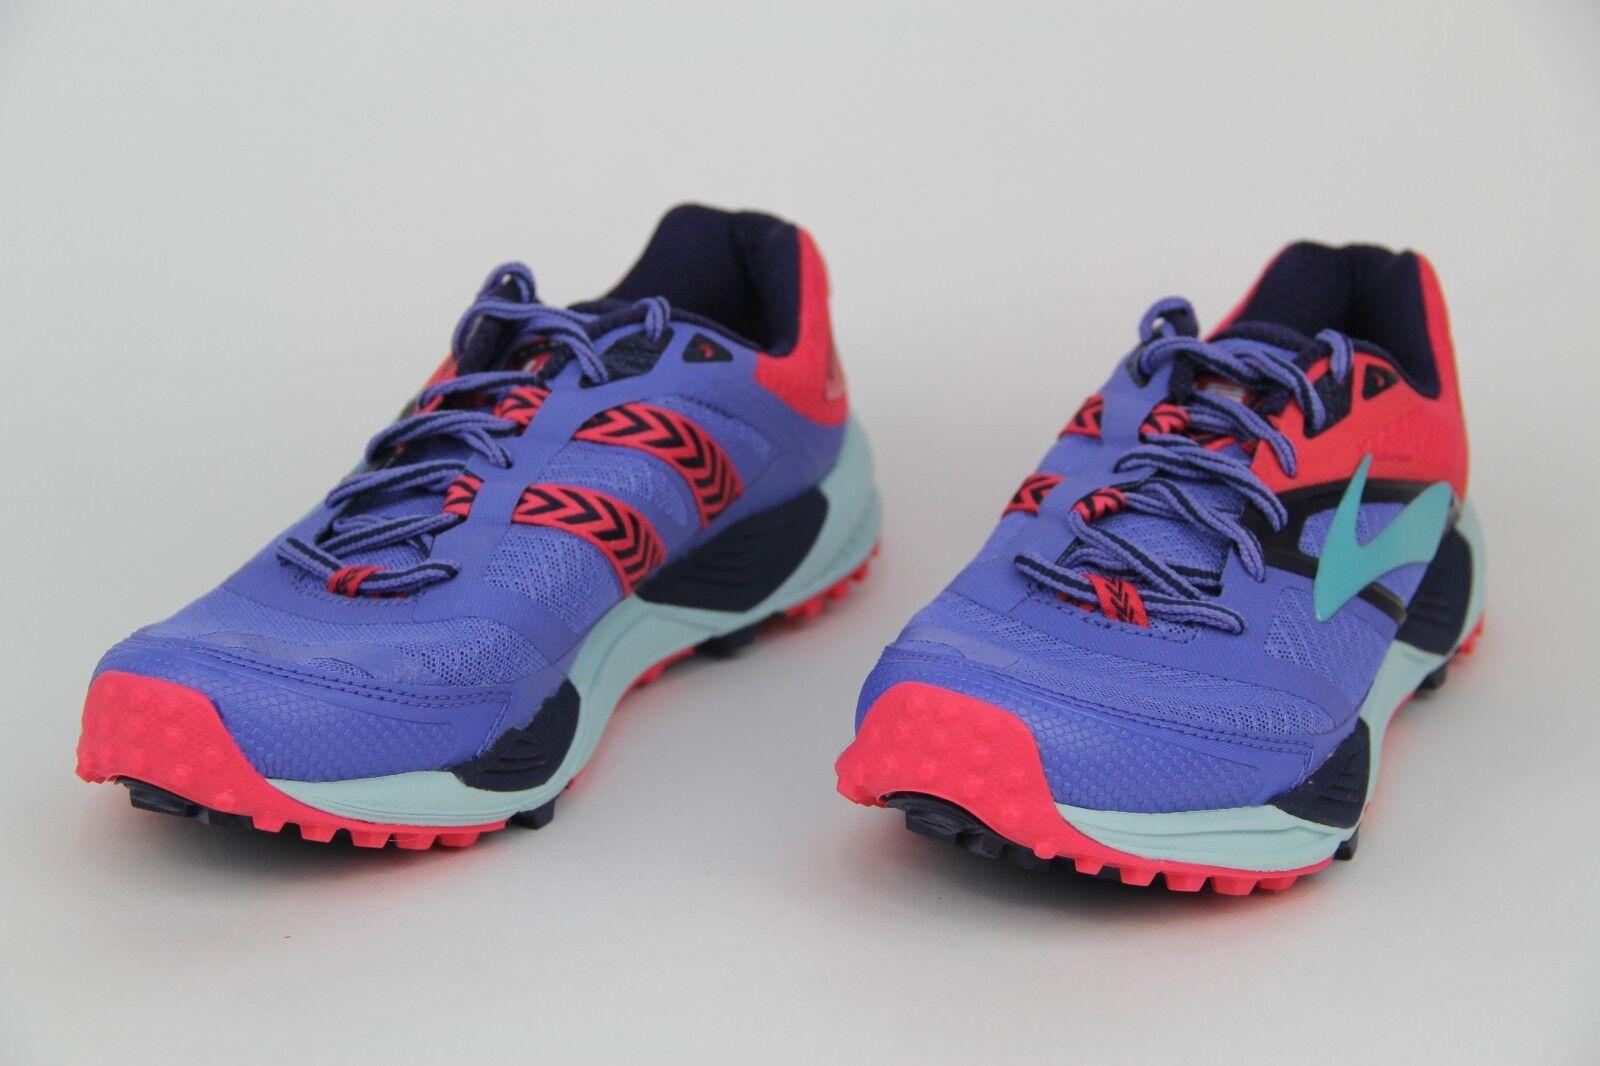 Brooks Cascadia 12 Running schuhe Athletic Turnschuhe lila rot Blau Wmns Größe 8